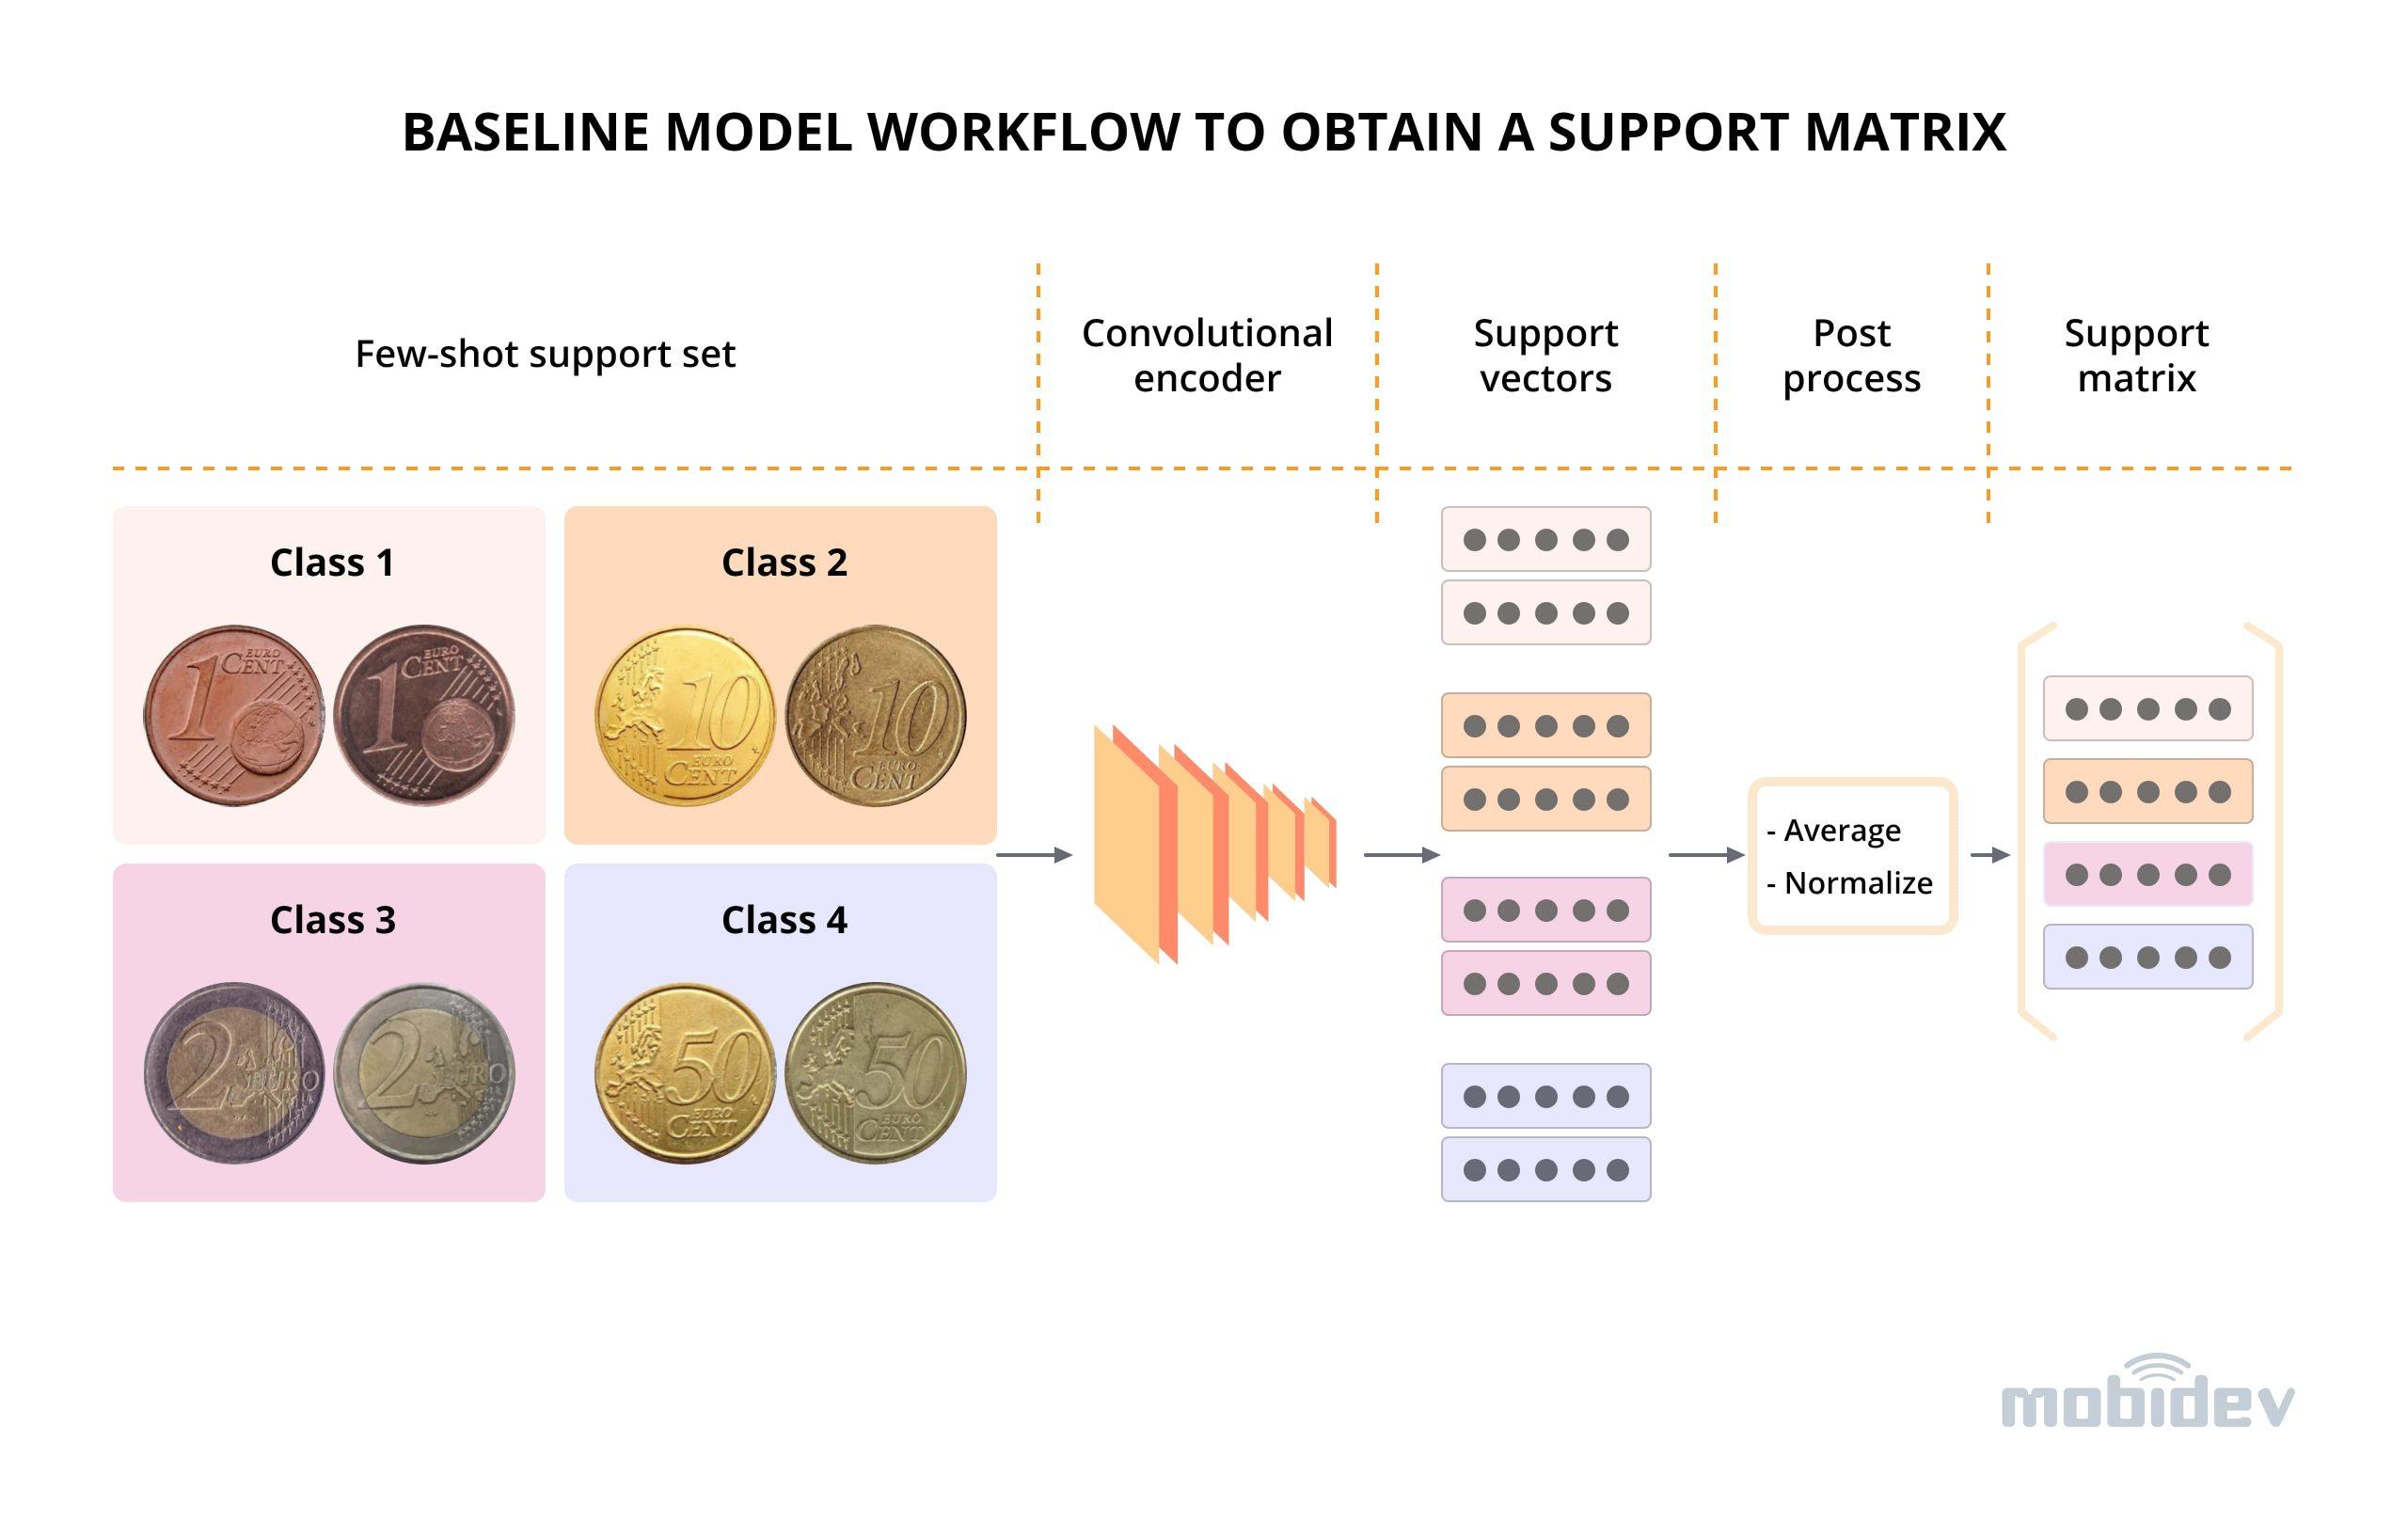 Figure 5. Baseline model workflow to obtain a support matrix